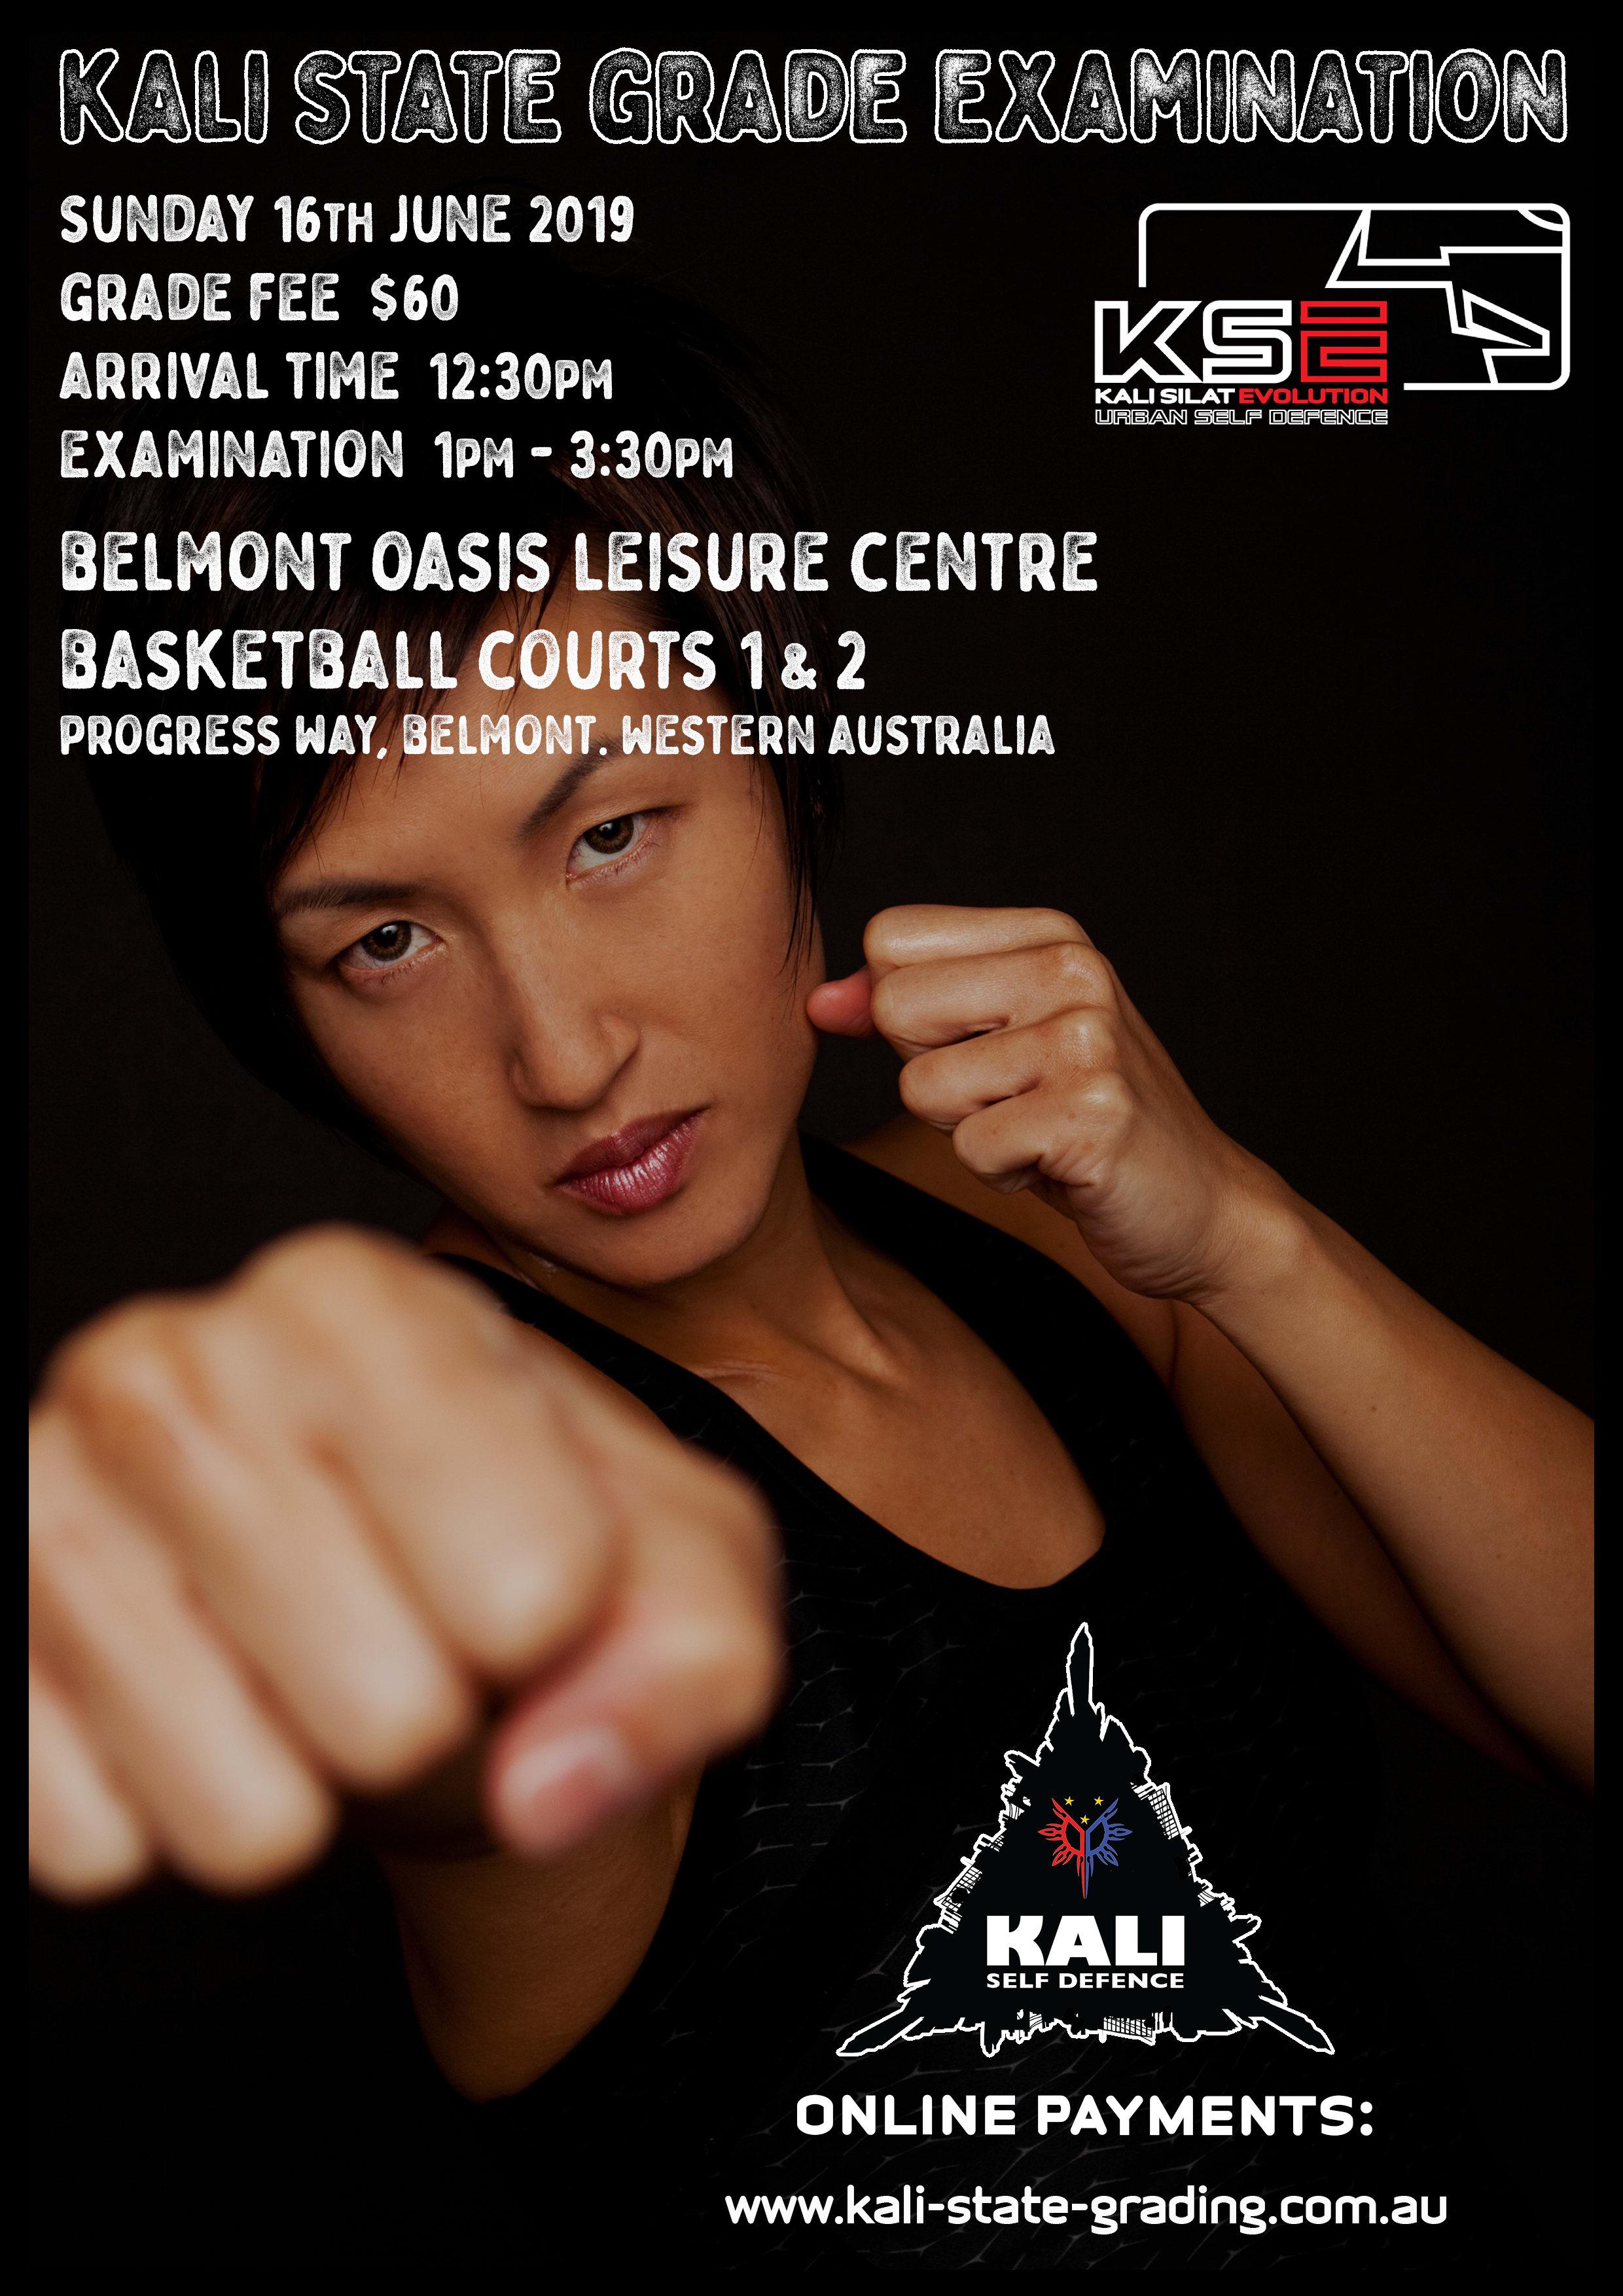 KALI GRADING in East Victoria Park - Advanced Martial Arts & Fitness